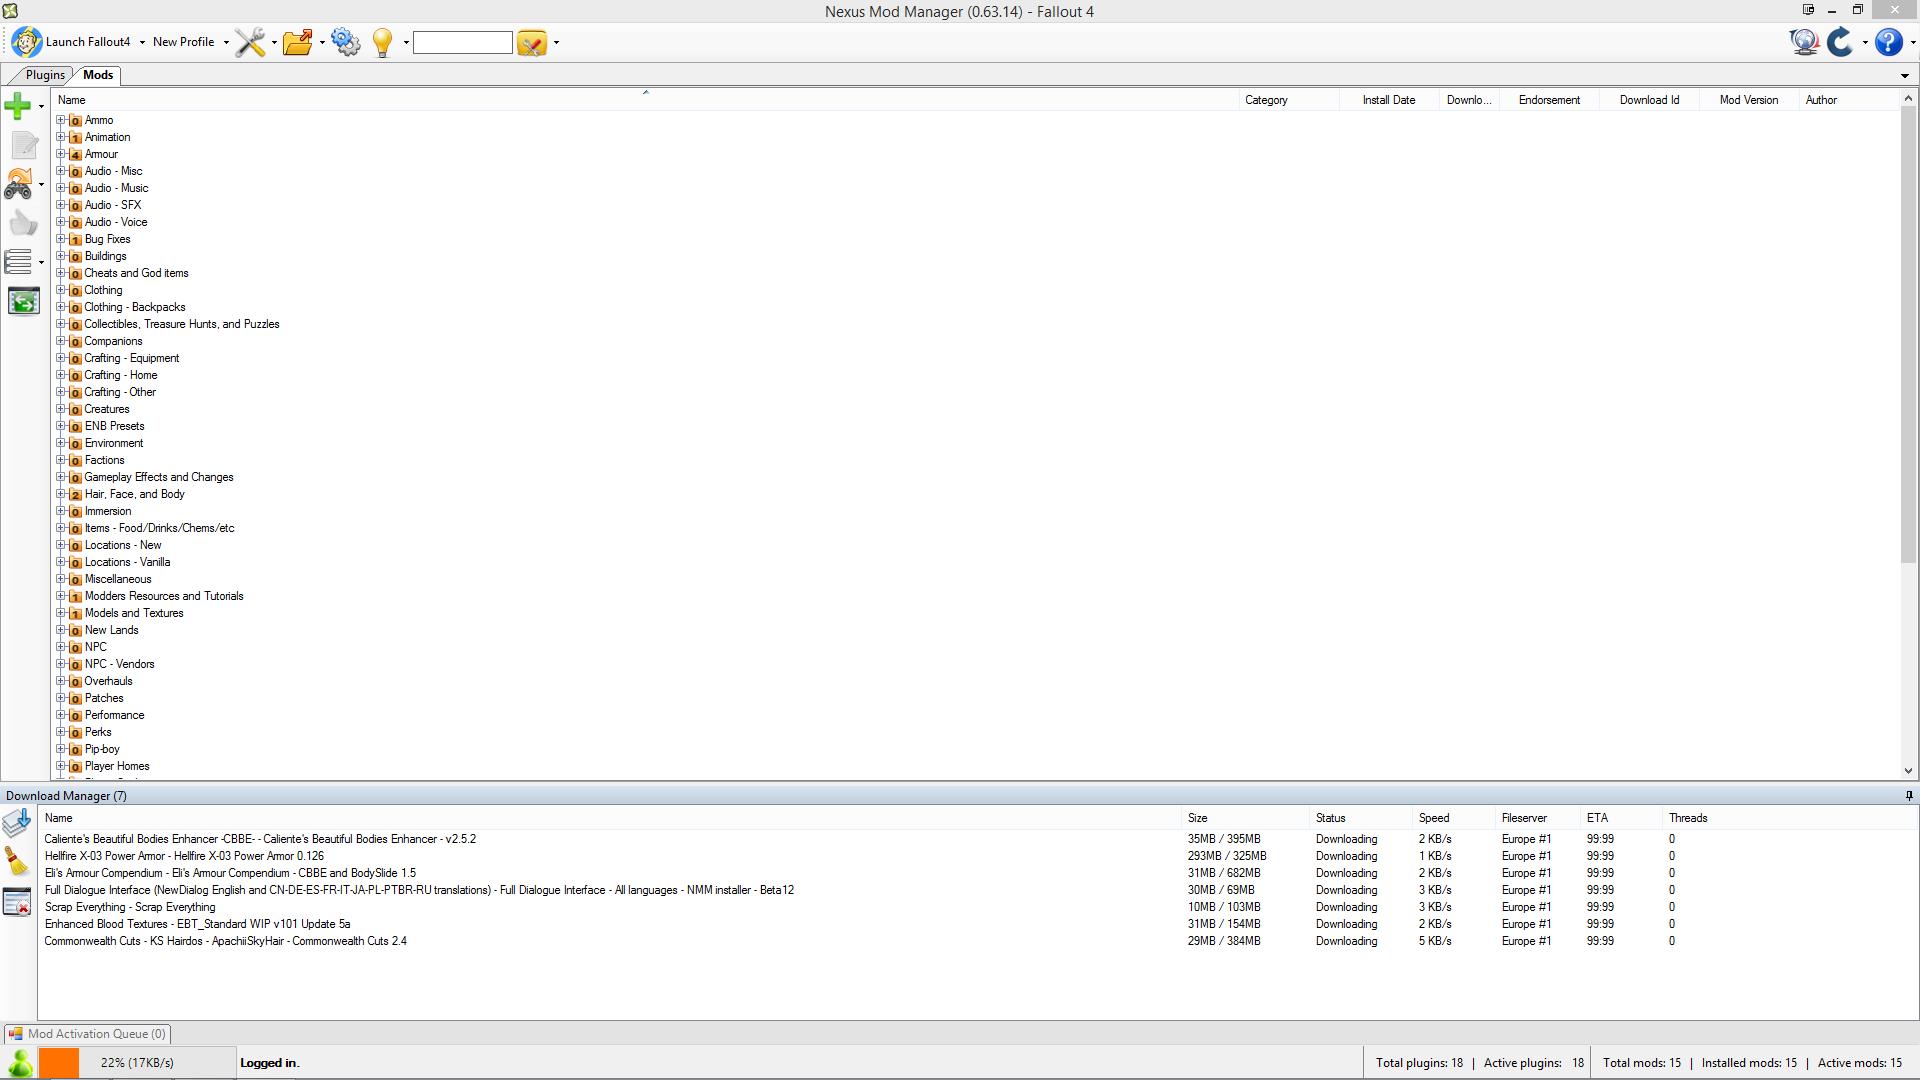 nexus mods download manager